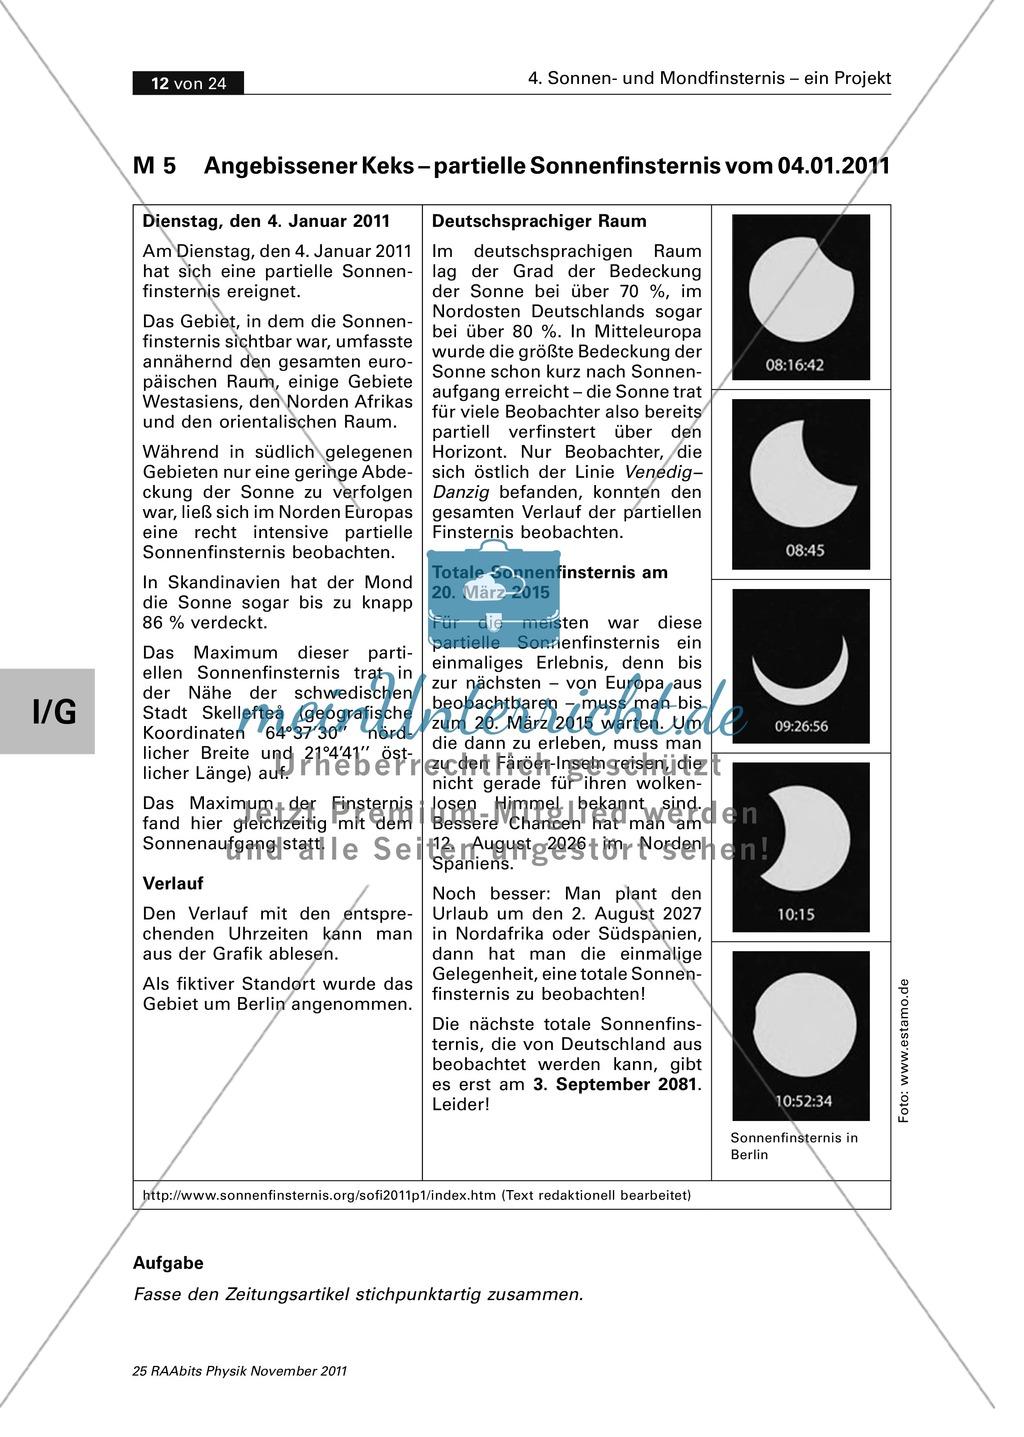 Charmant Teleskop Arbeitsblatt Galerie - Super Lehrer Arbeitsblätter ...